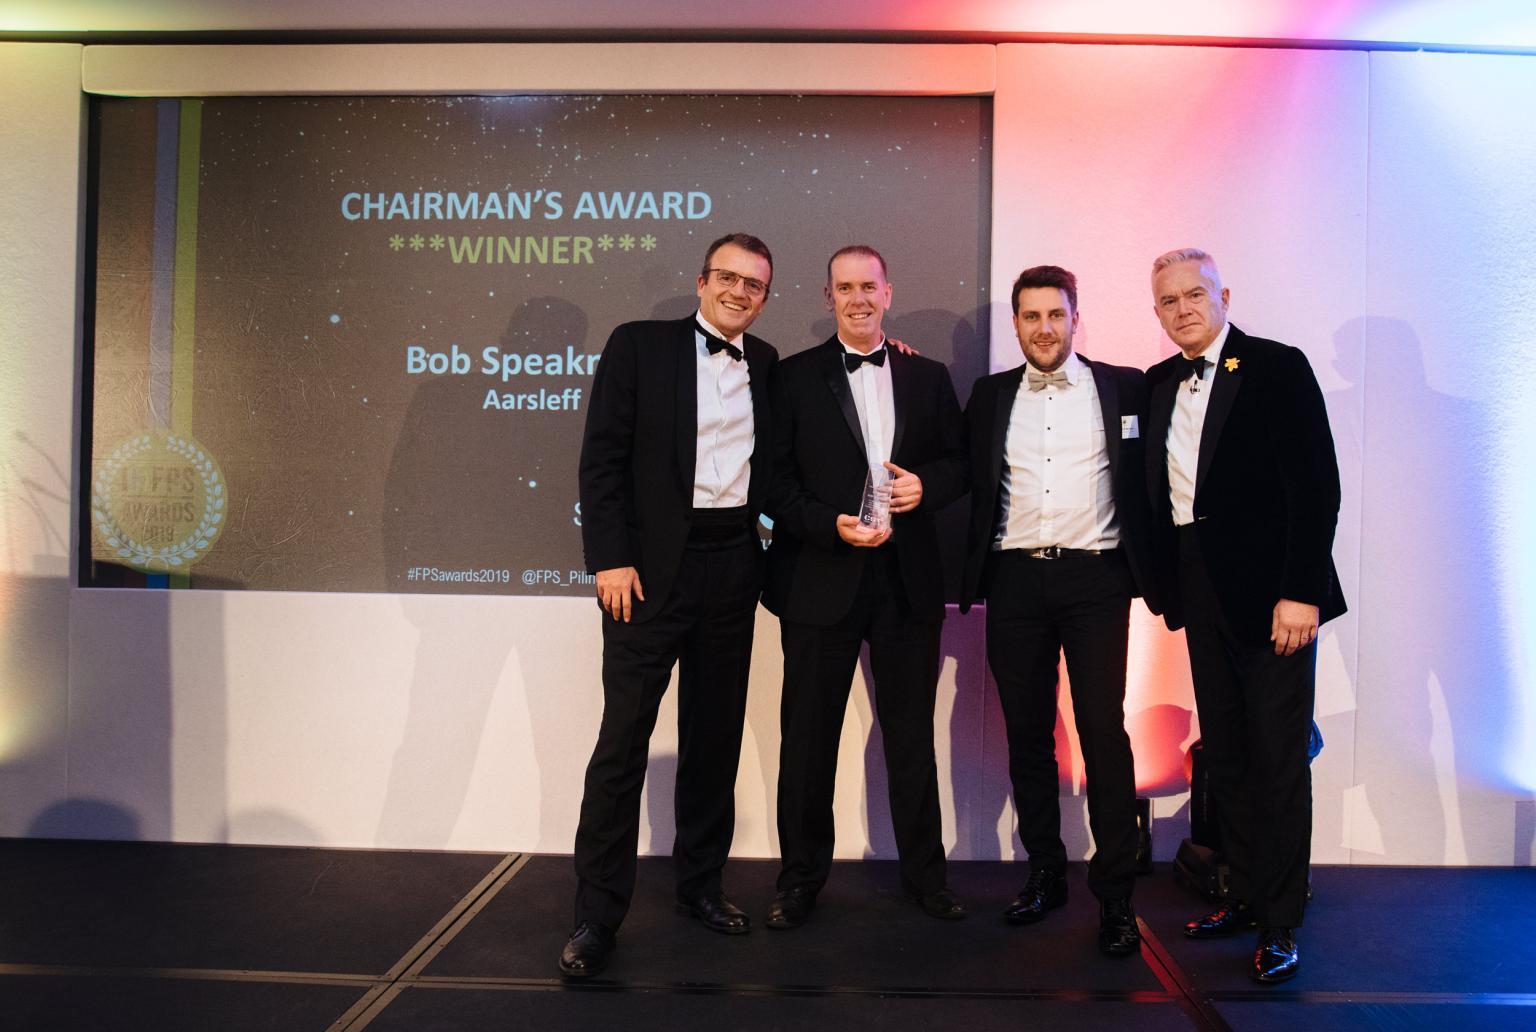 Robert Speakman - winner of the FPS Chair's Award